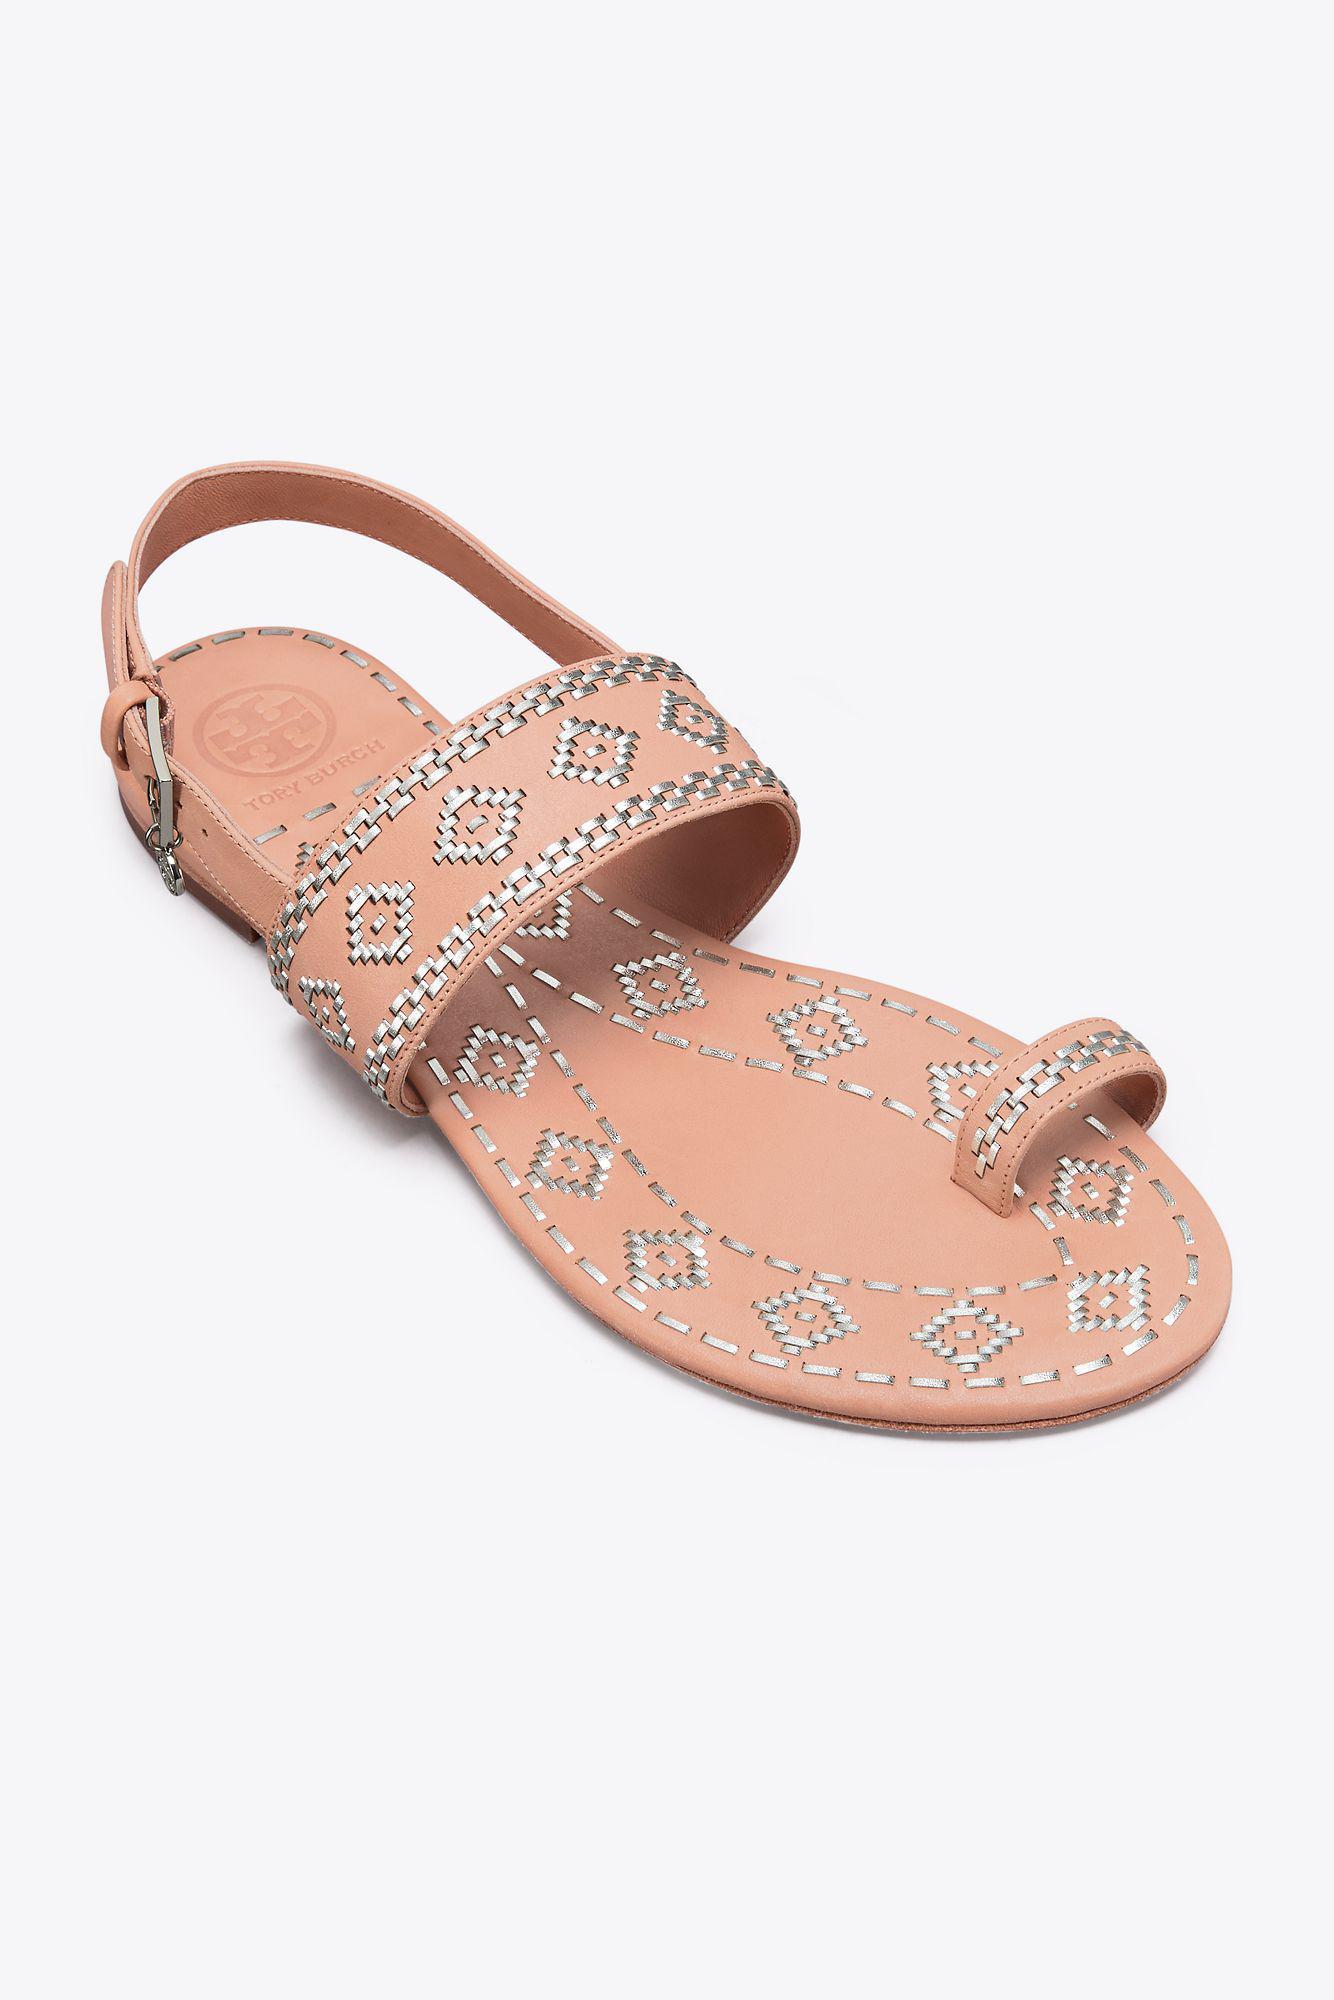 6a1520701ad7 Lyst - Tory Burch Blake Metallic-stitch Ankle-strap Sandal